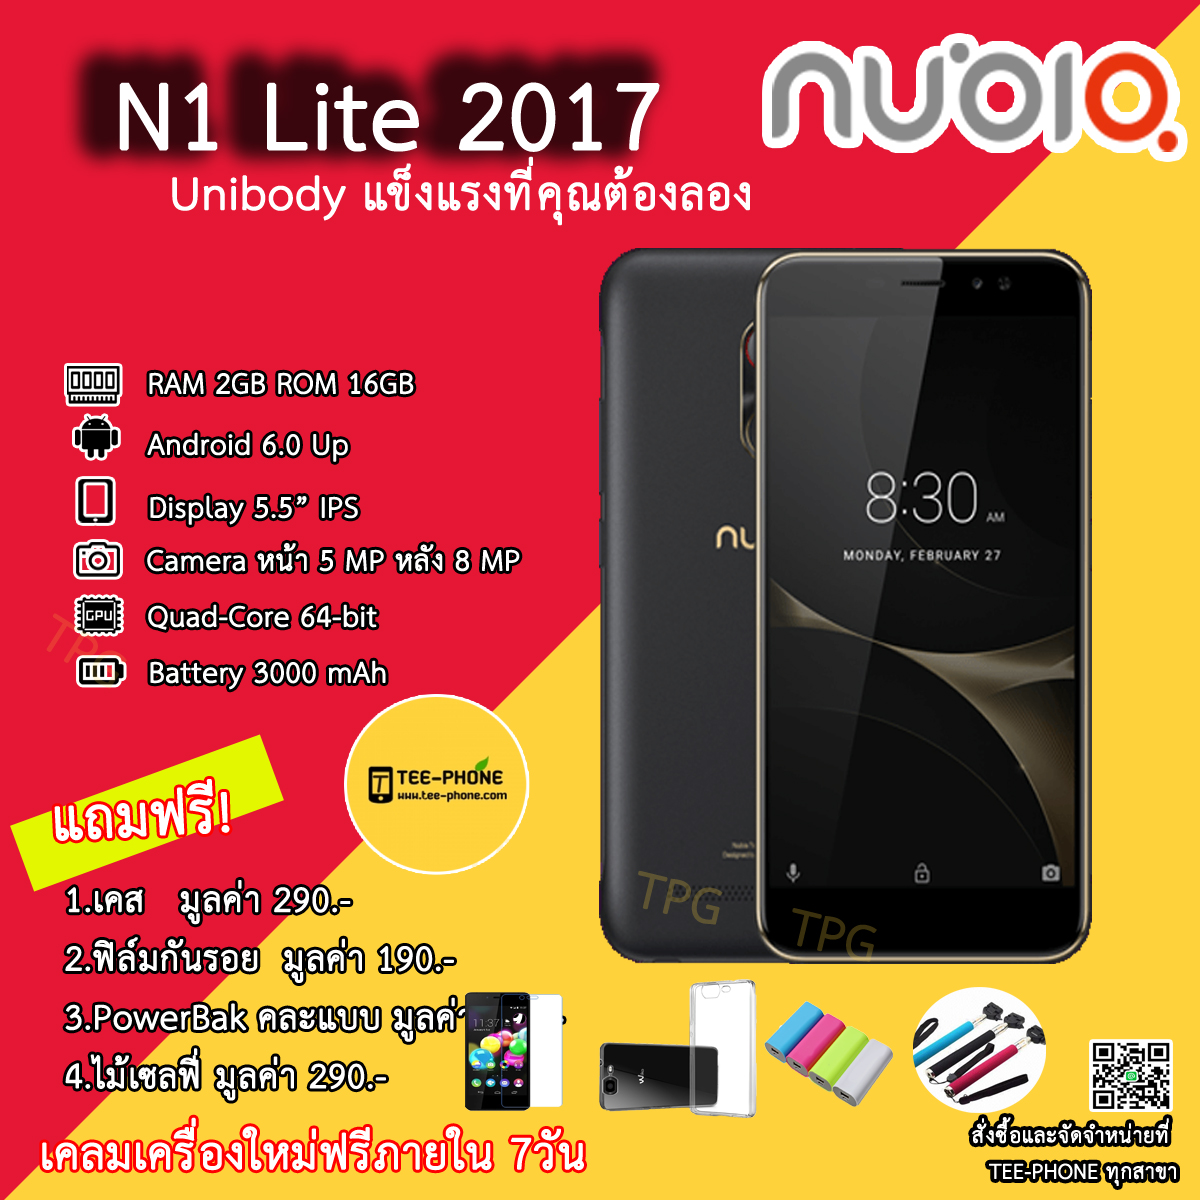 "Nubia N1 Lite 5.5"" (RAM2GB+ROM16GB) สี Black Golden แถม เคส+ฟิล์ม+PowerBank+ไม้เซลฟี่"